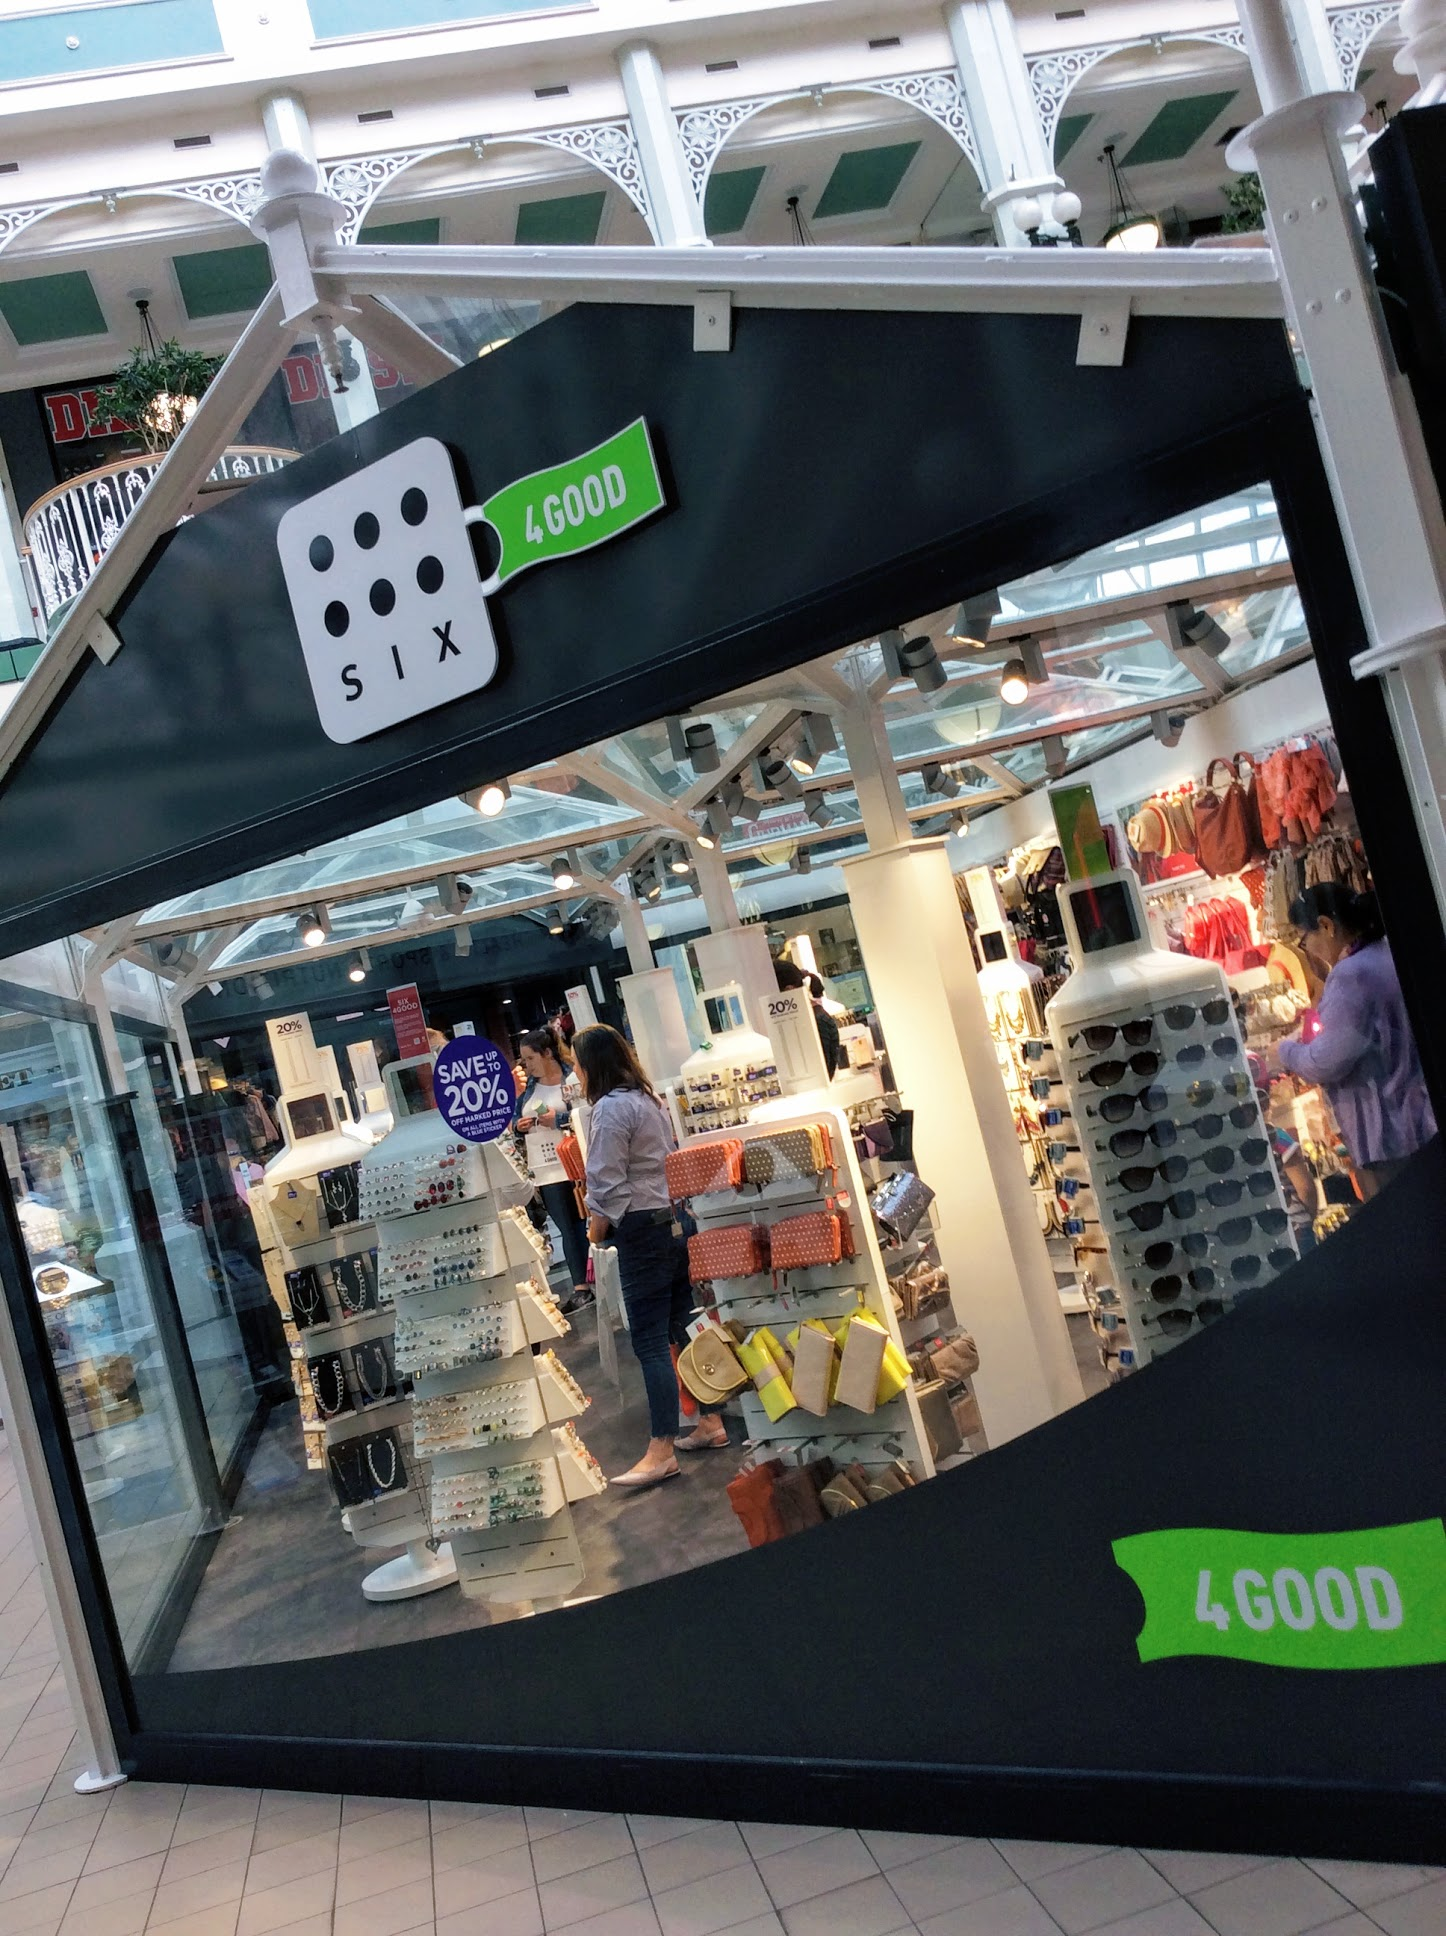 SIX4GOOD Shop , Stephens Green Shopping Centre Dublin 2 Ireland.